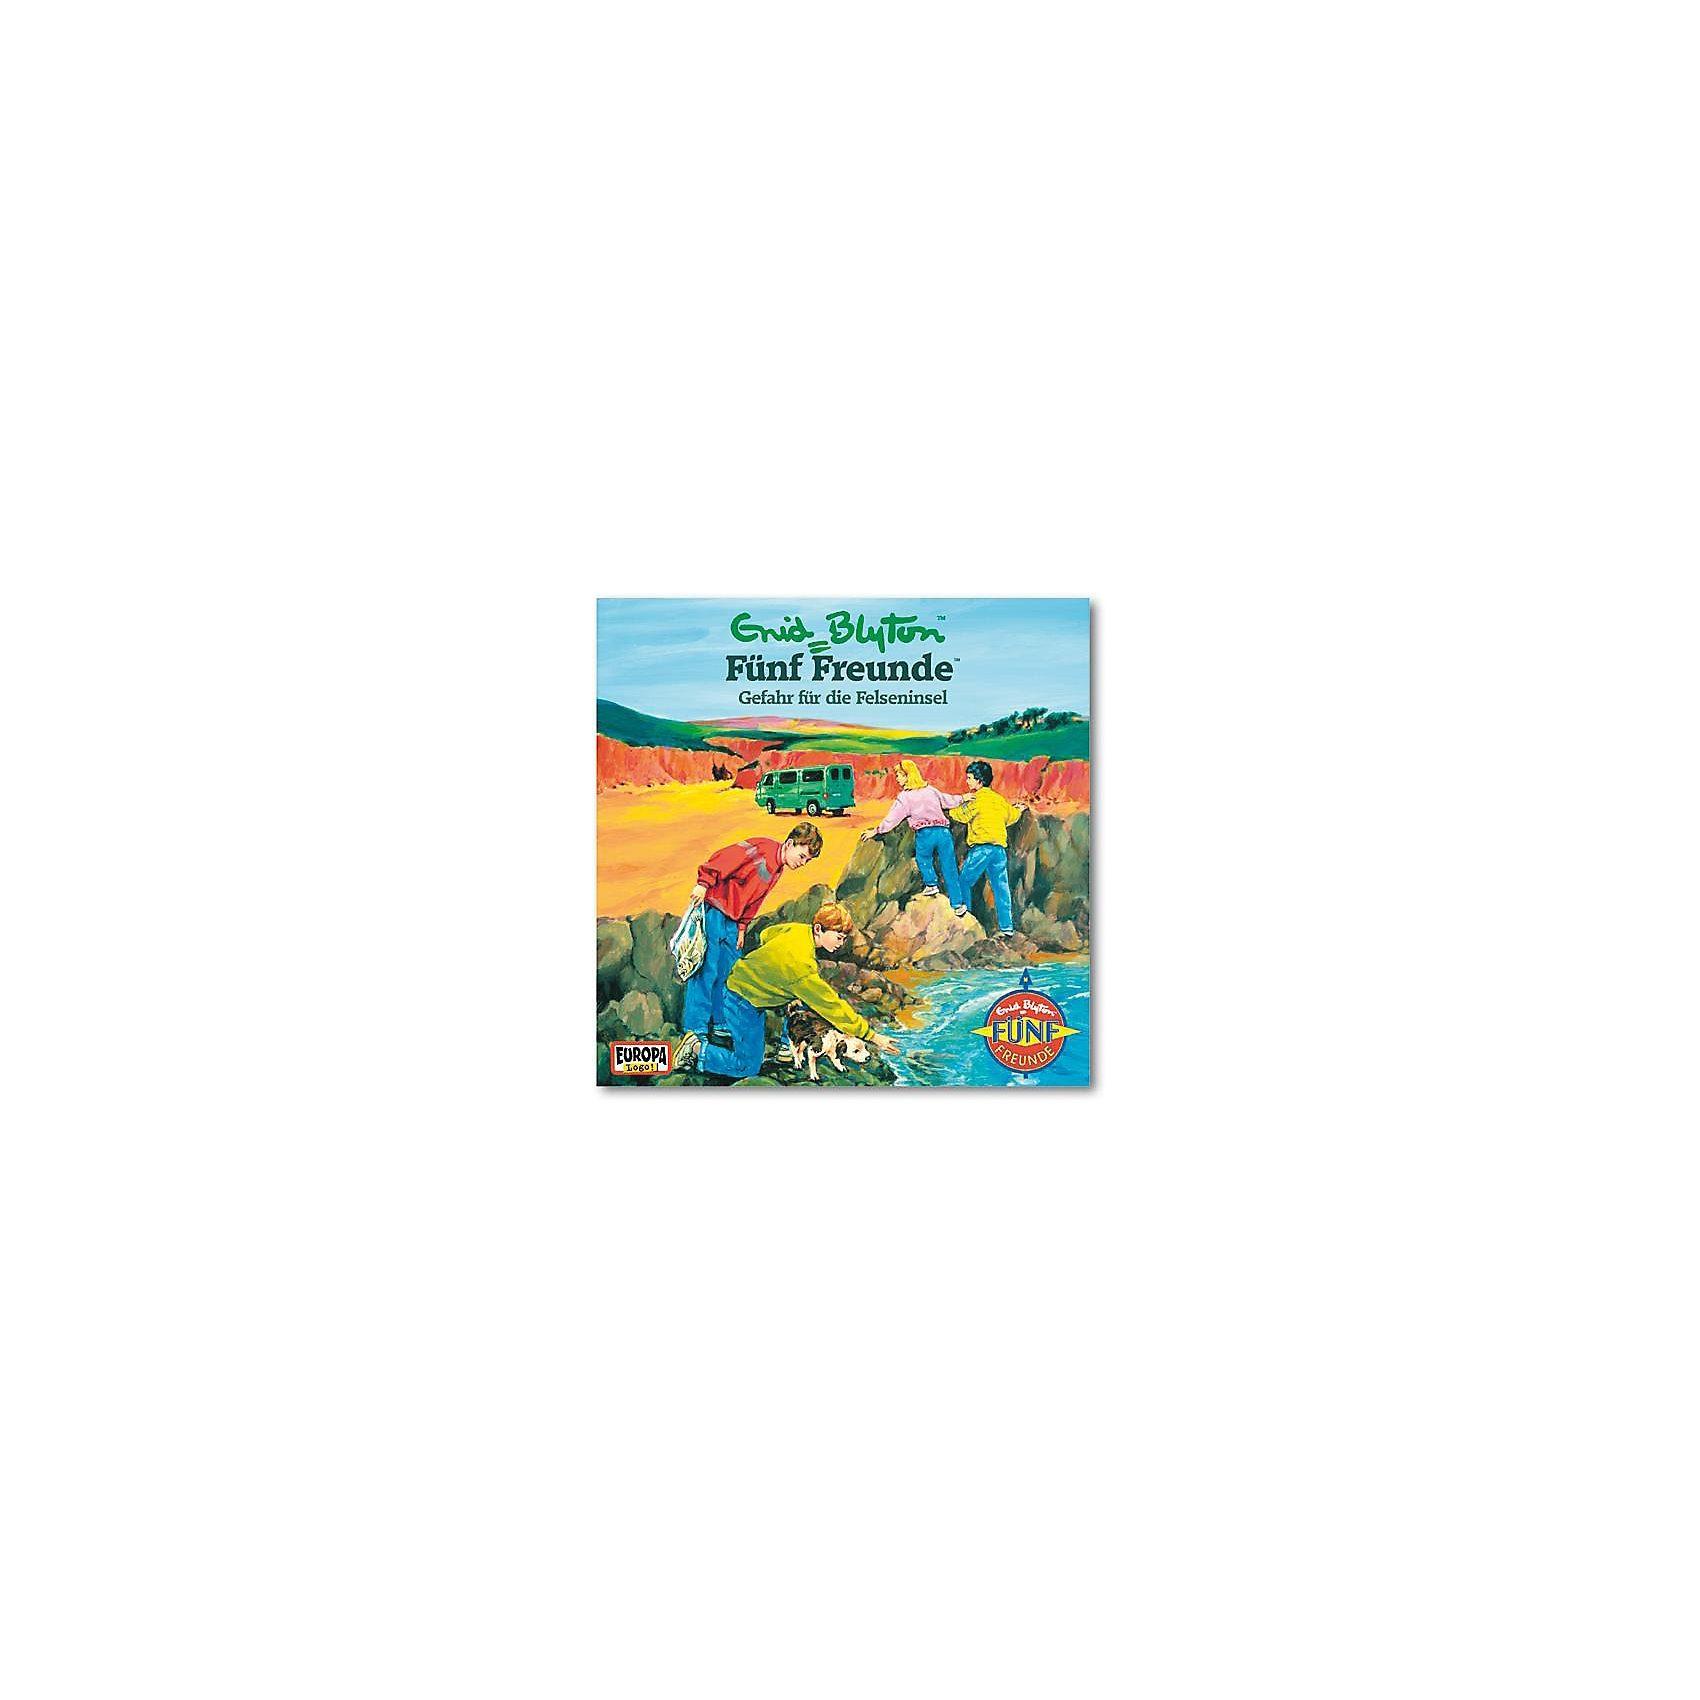 Sony CD Fünf Freunde 69 (Gefahr Felseninsel)